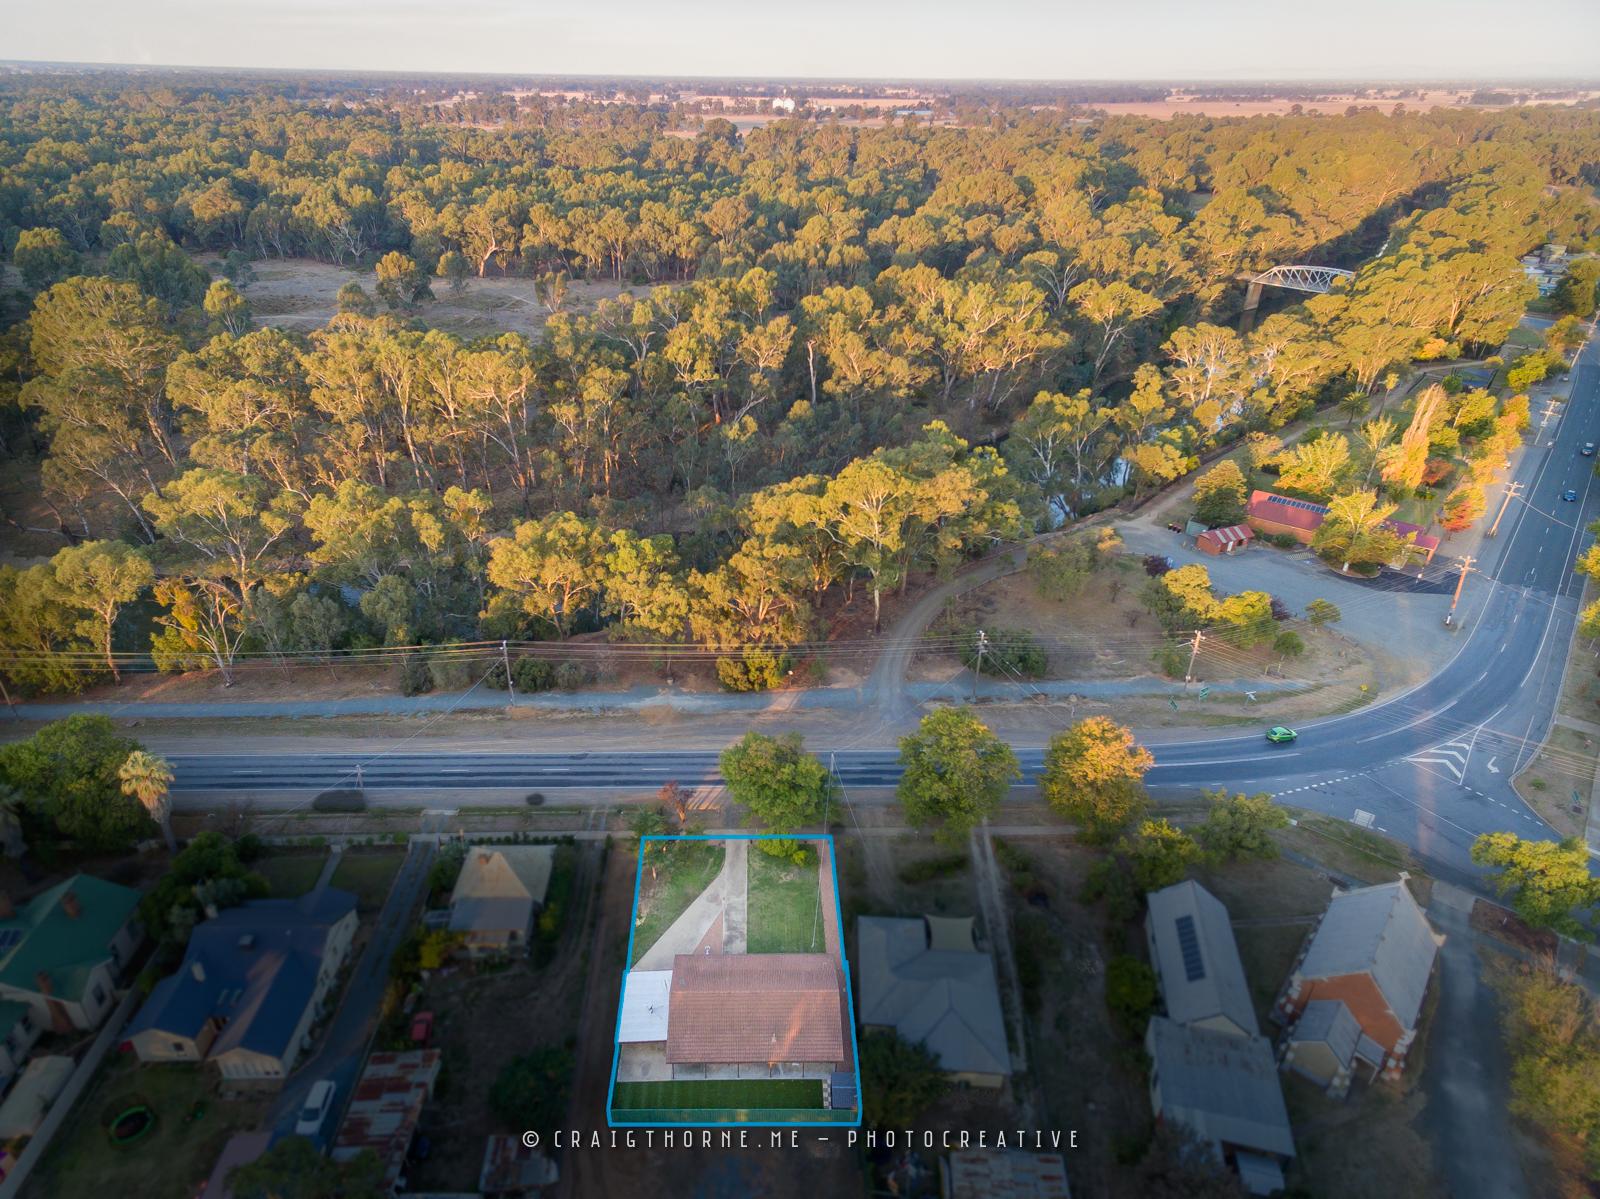 20180419-03-6-River-Rd-Murchison-©CT-THN_0409-SkyView.jpg